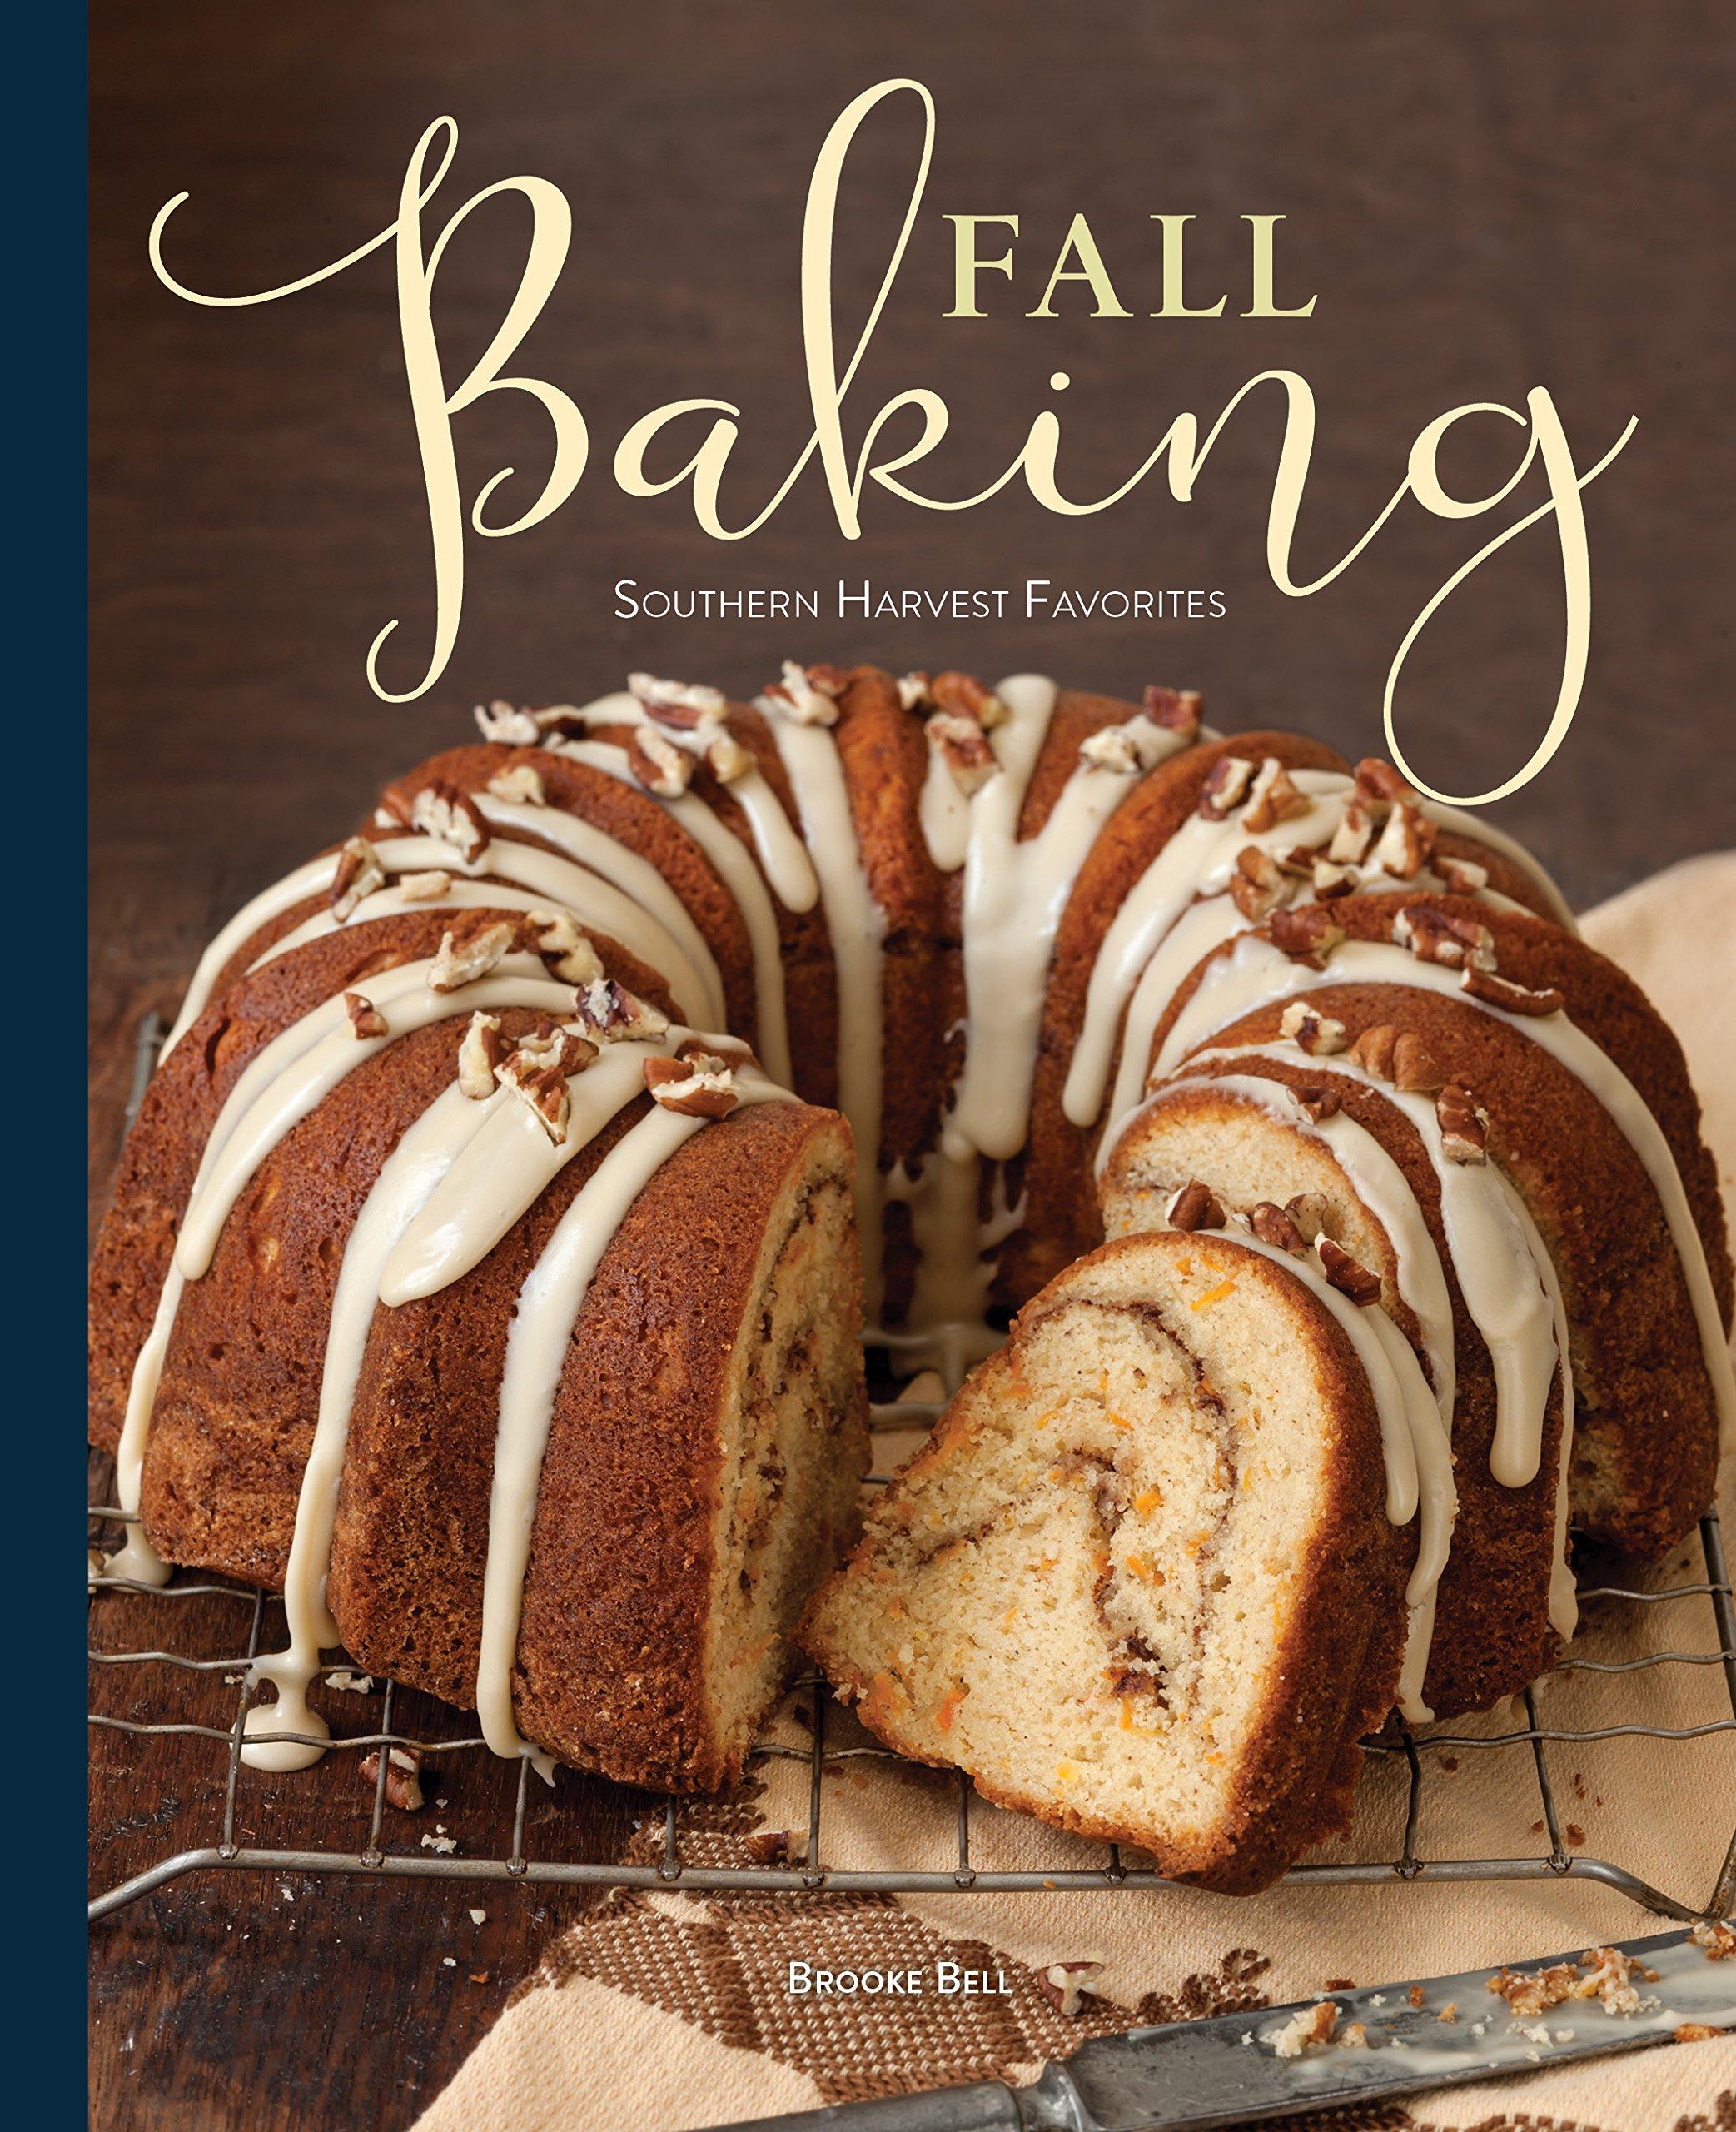 Fall Baking: Southern Harvest Favorites